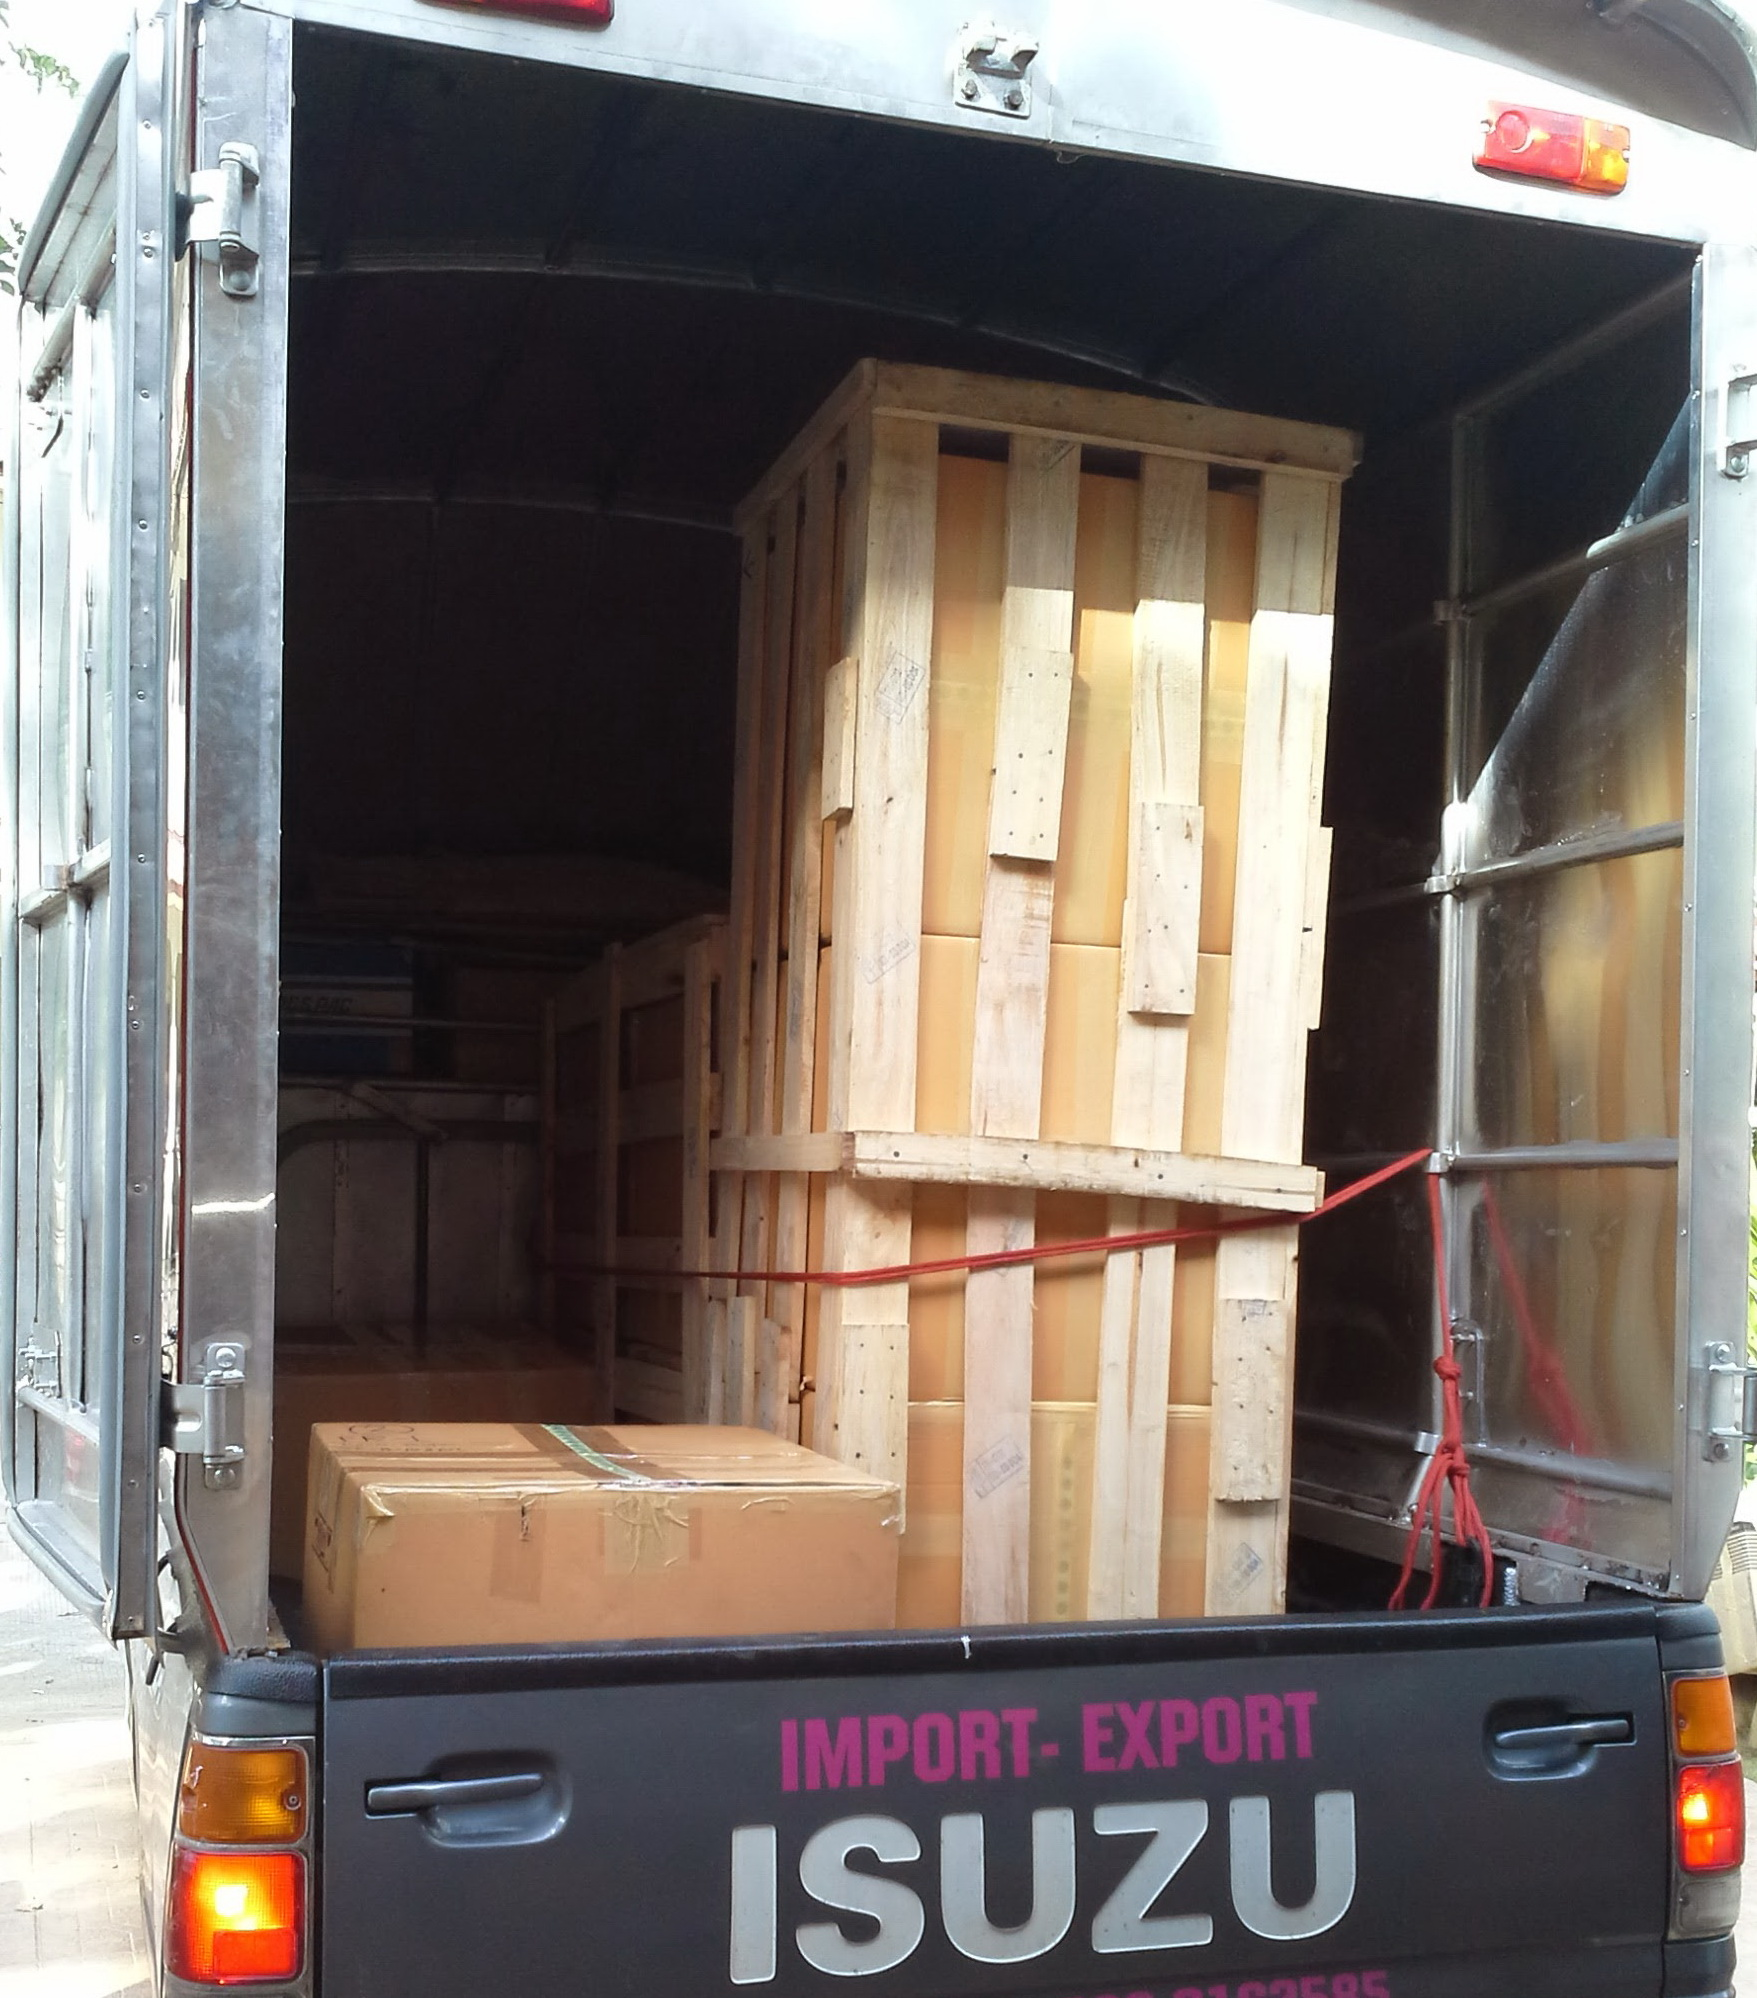 Franch shipment